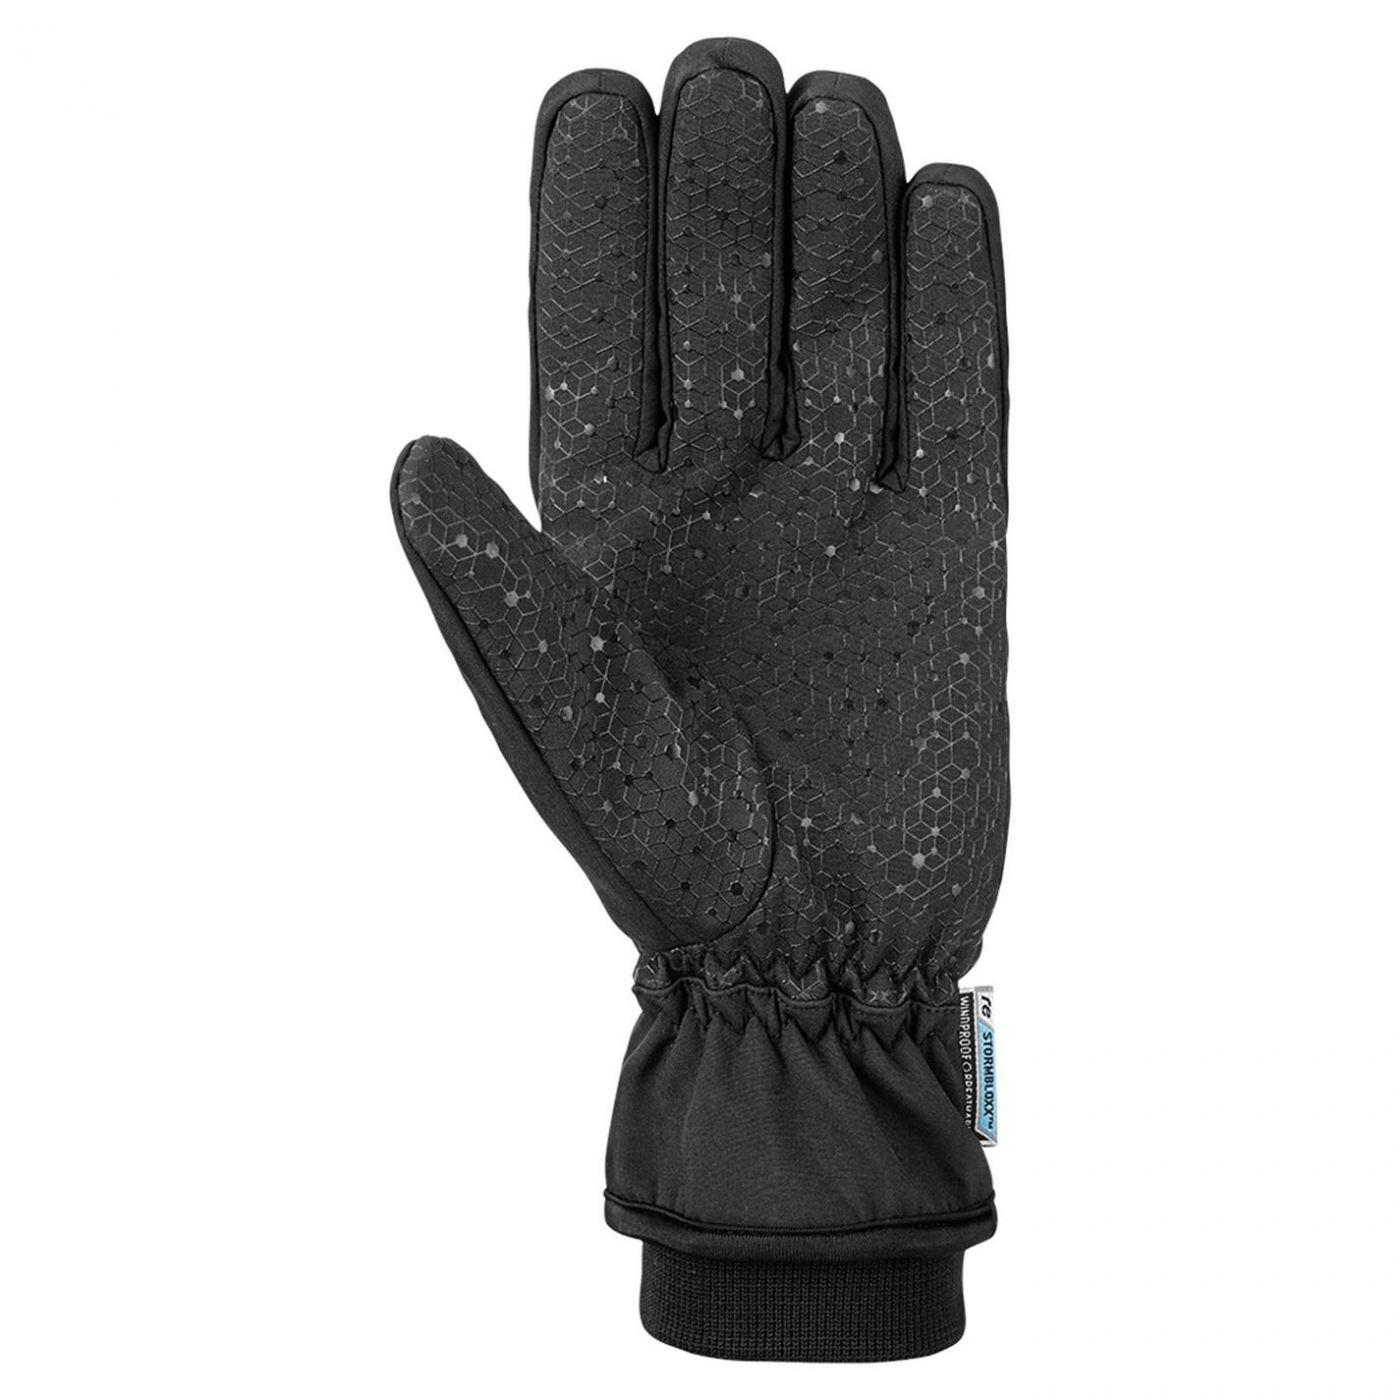 Reusch Kolero Gloves Mens